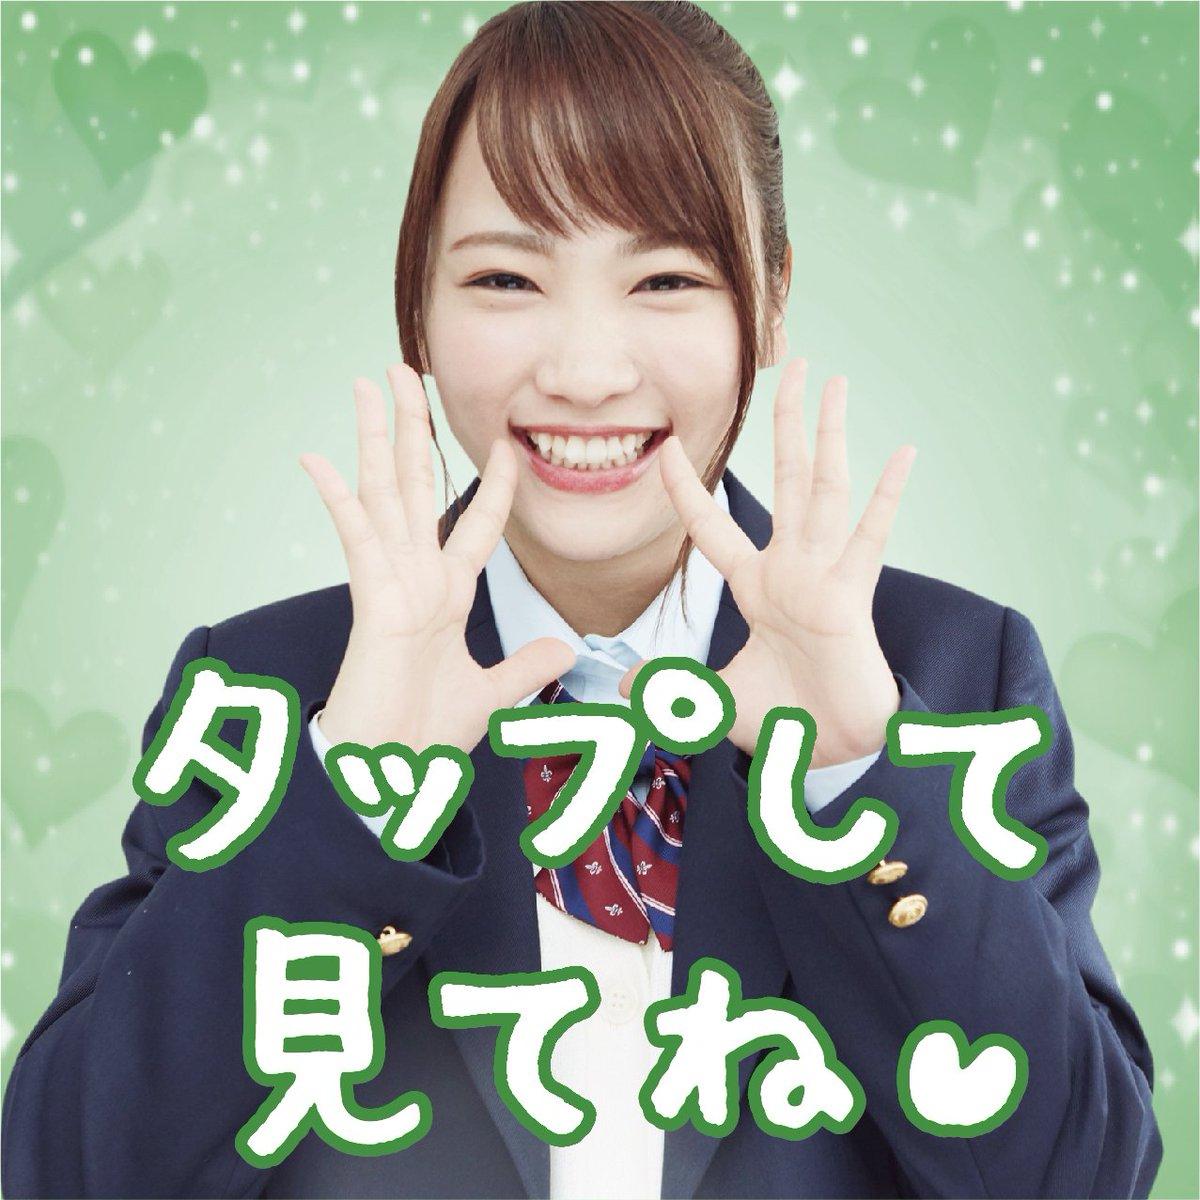 Simeji(日本語入力キーボード)さんの動画キャプチャー